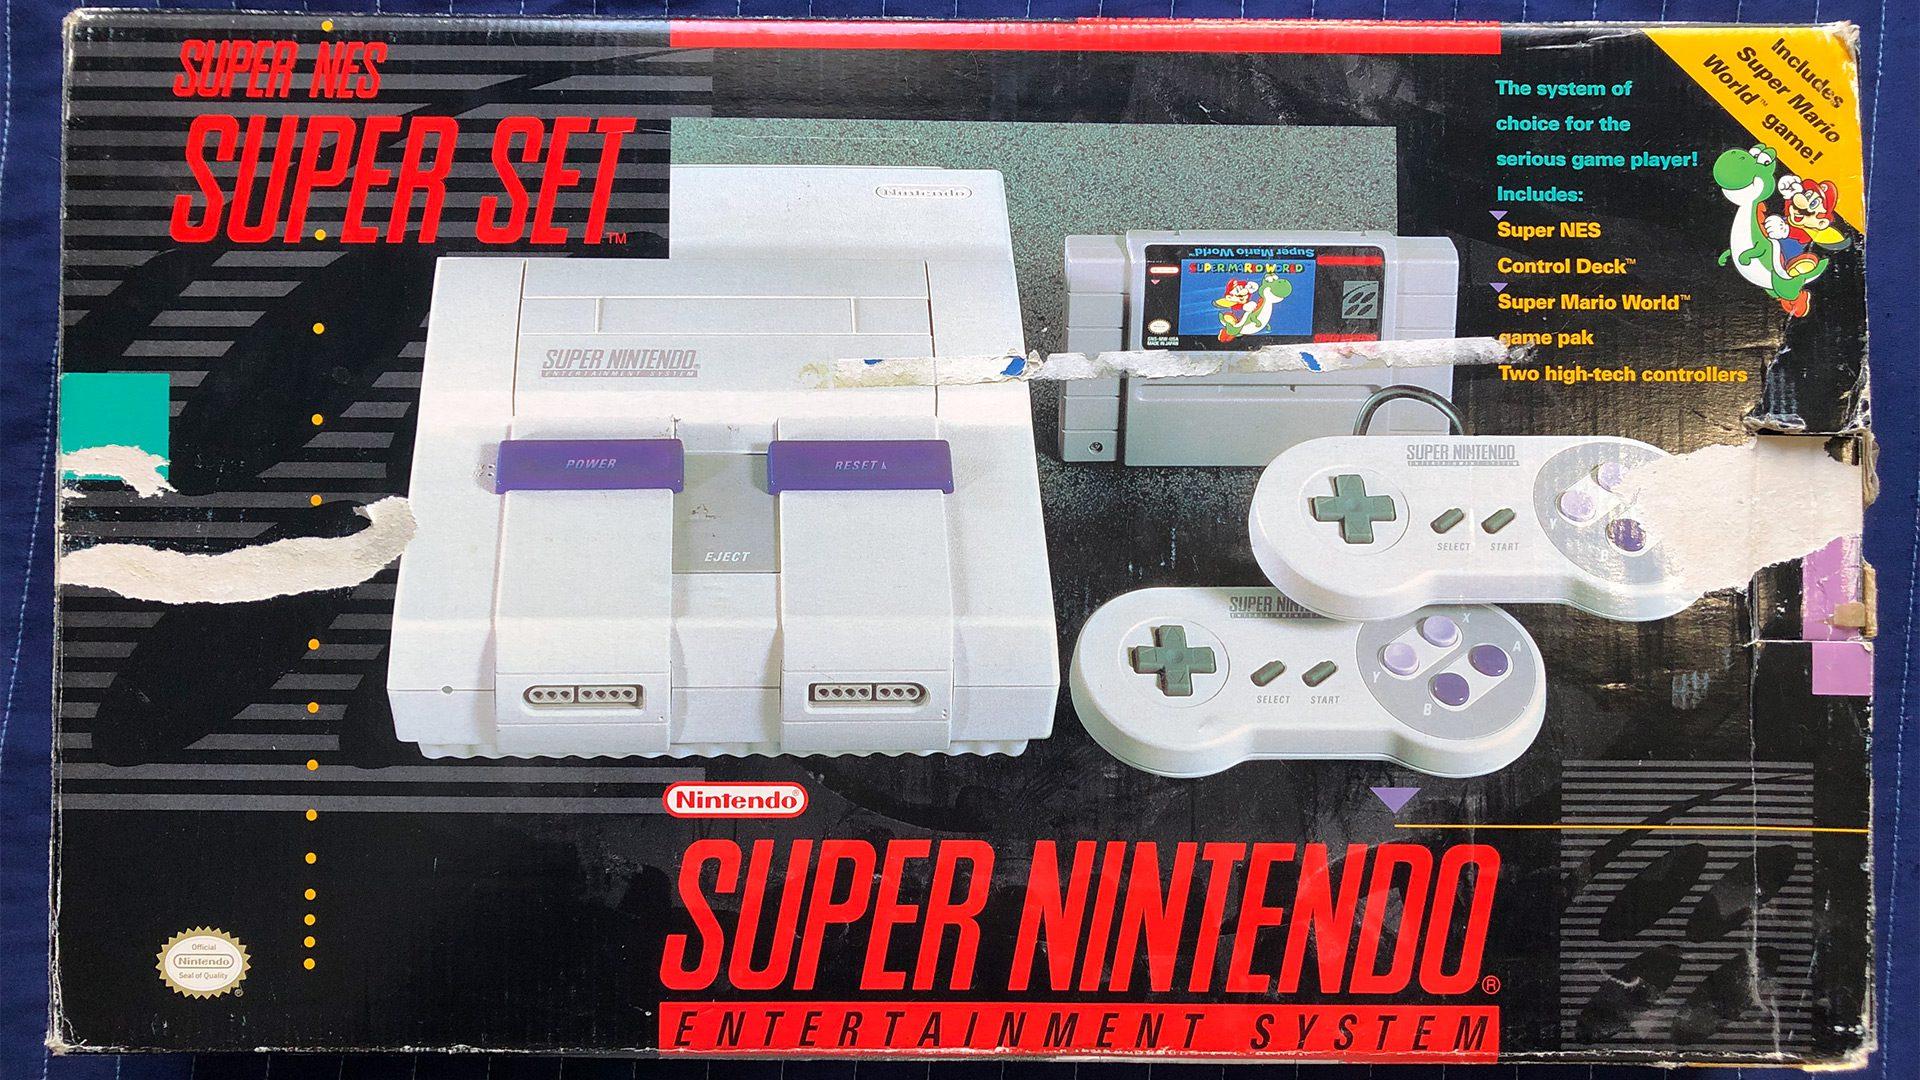 Well-worn packaging for the Super Nintendo Super Set bundle